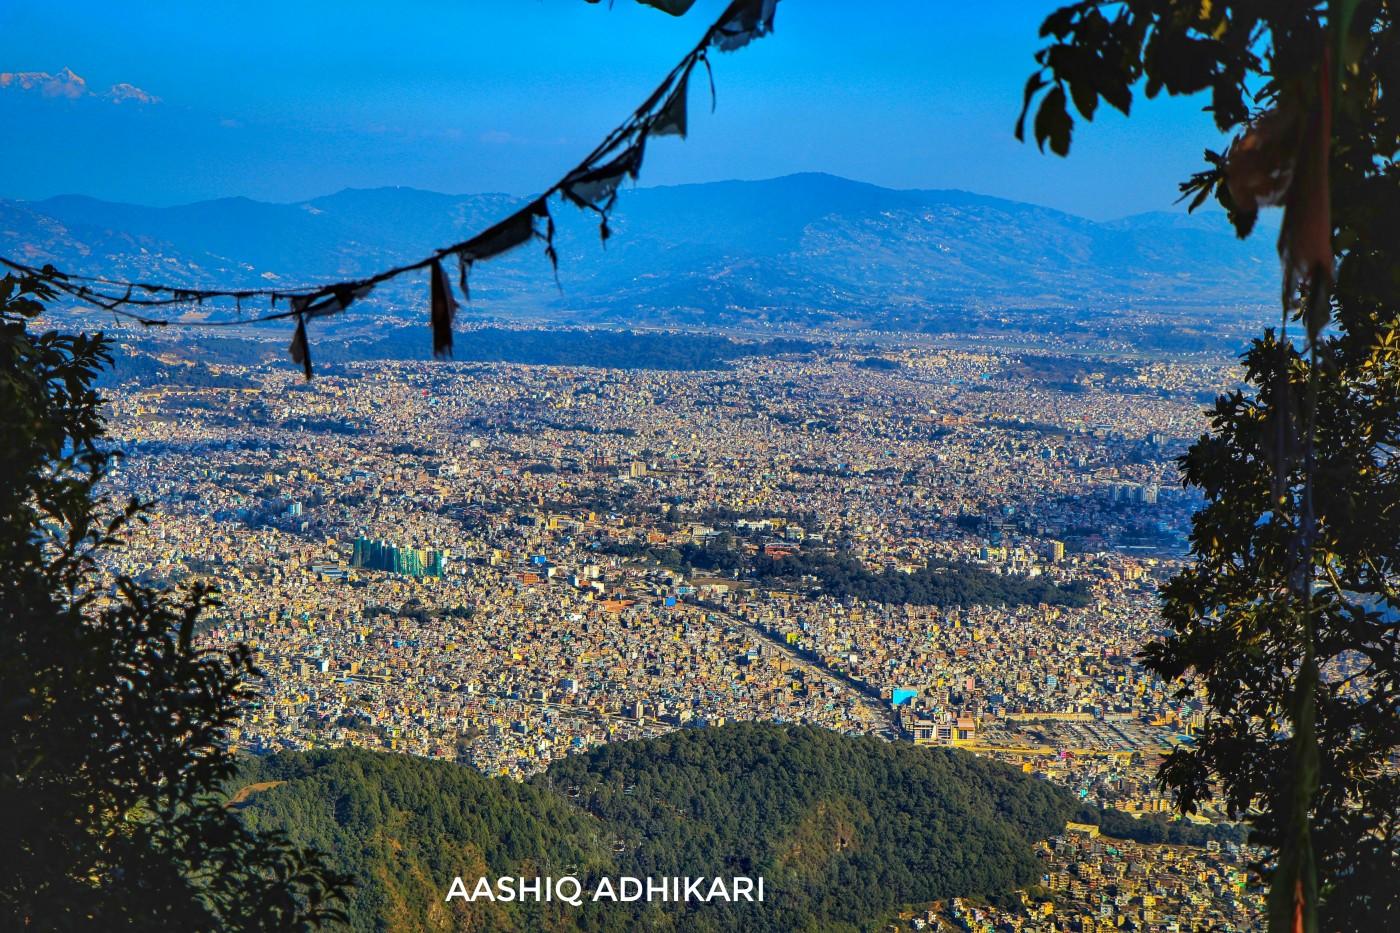 Kathmandu Valley as seen from Jamacho height, Shivapuri-Nagarjun National Park.